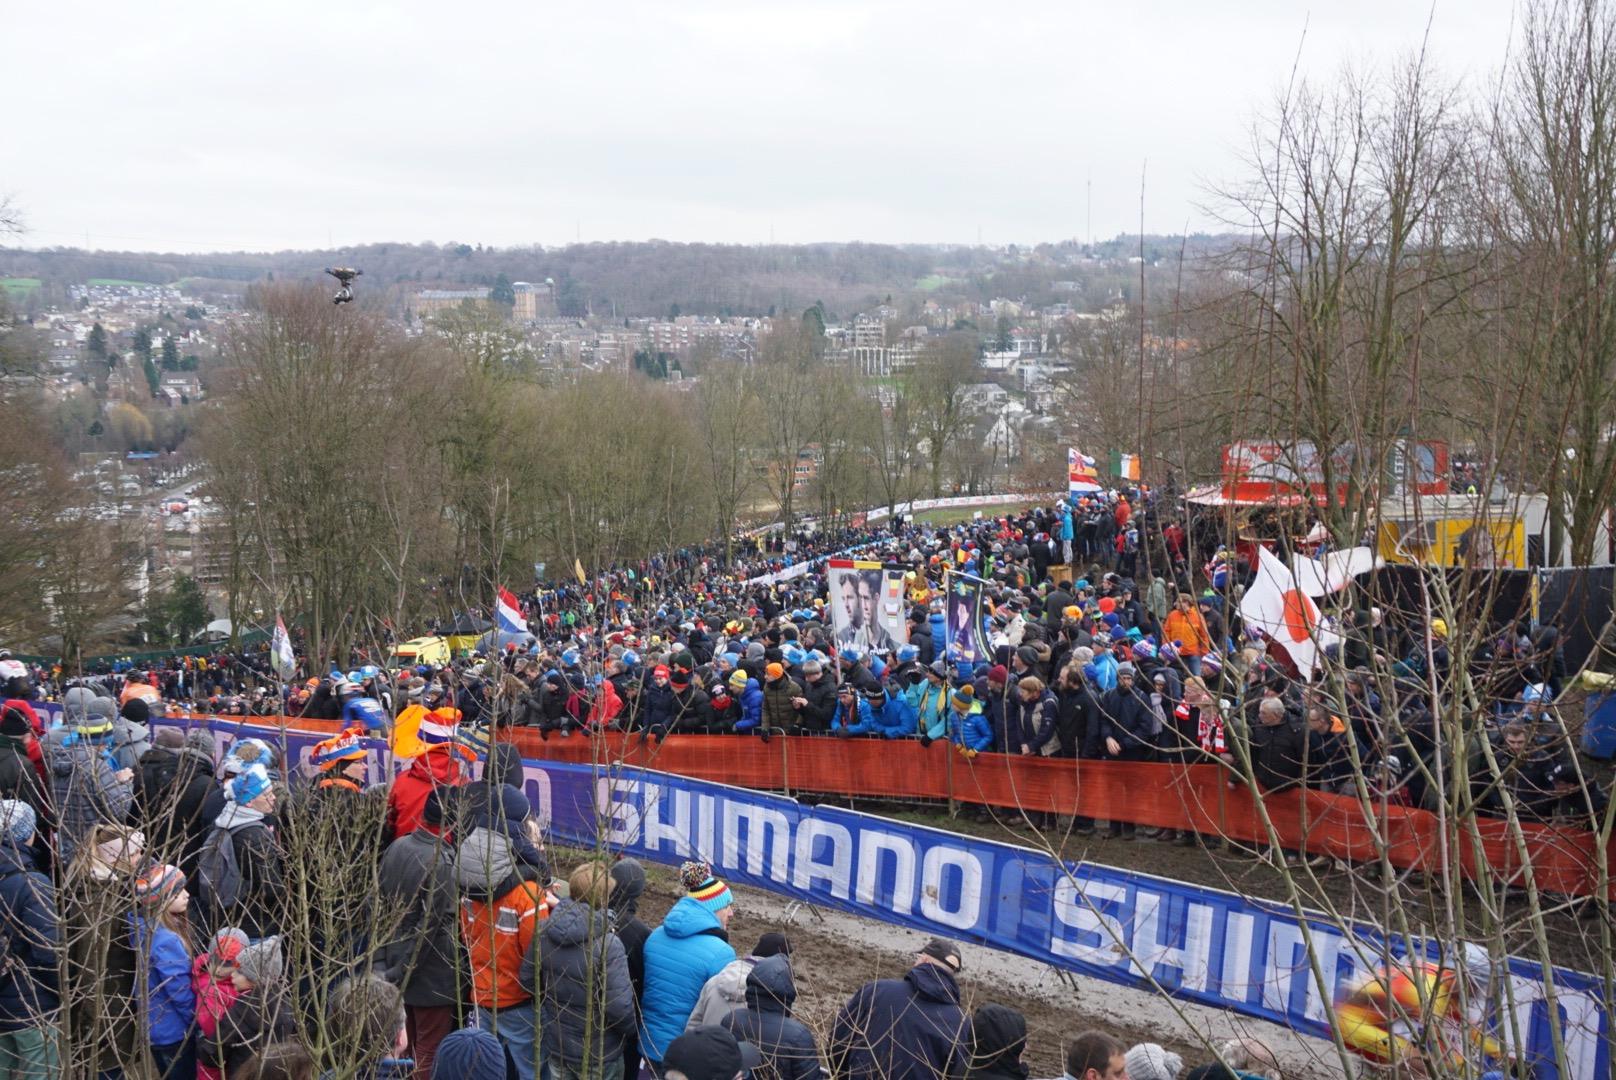 A sea of spectators. CRAYYYY-Z.